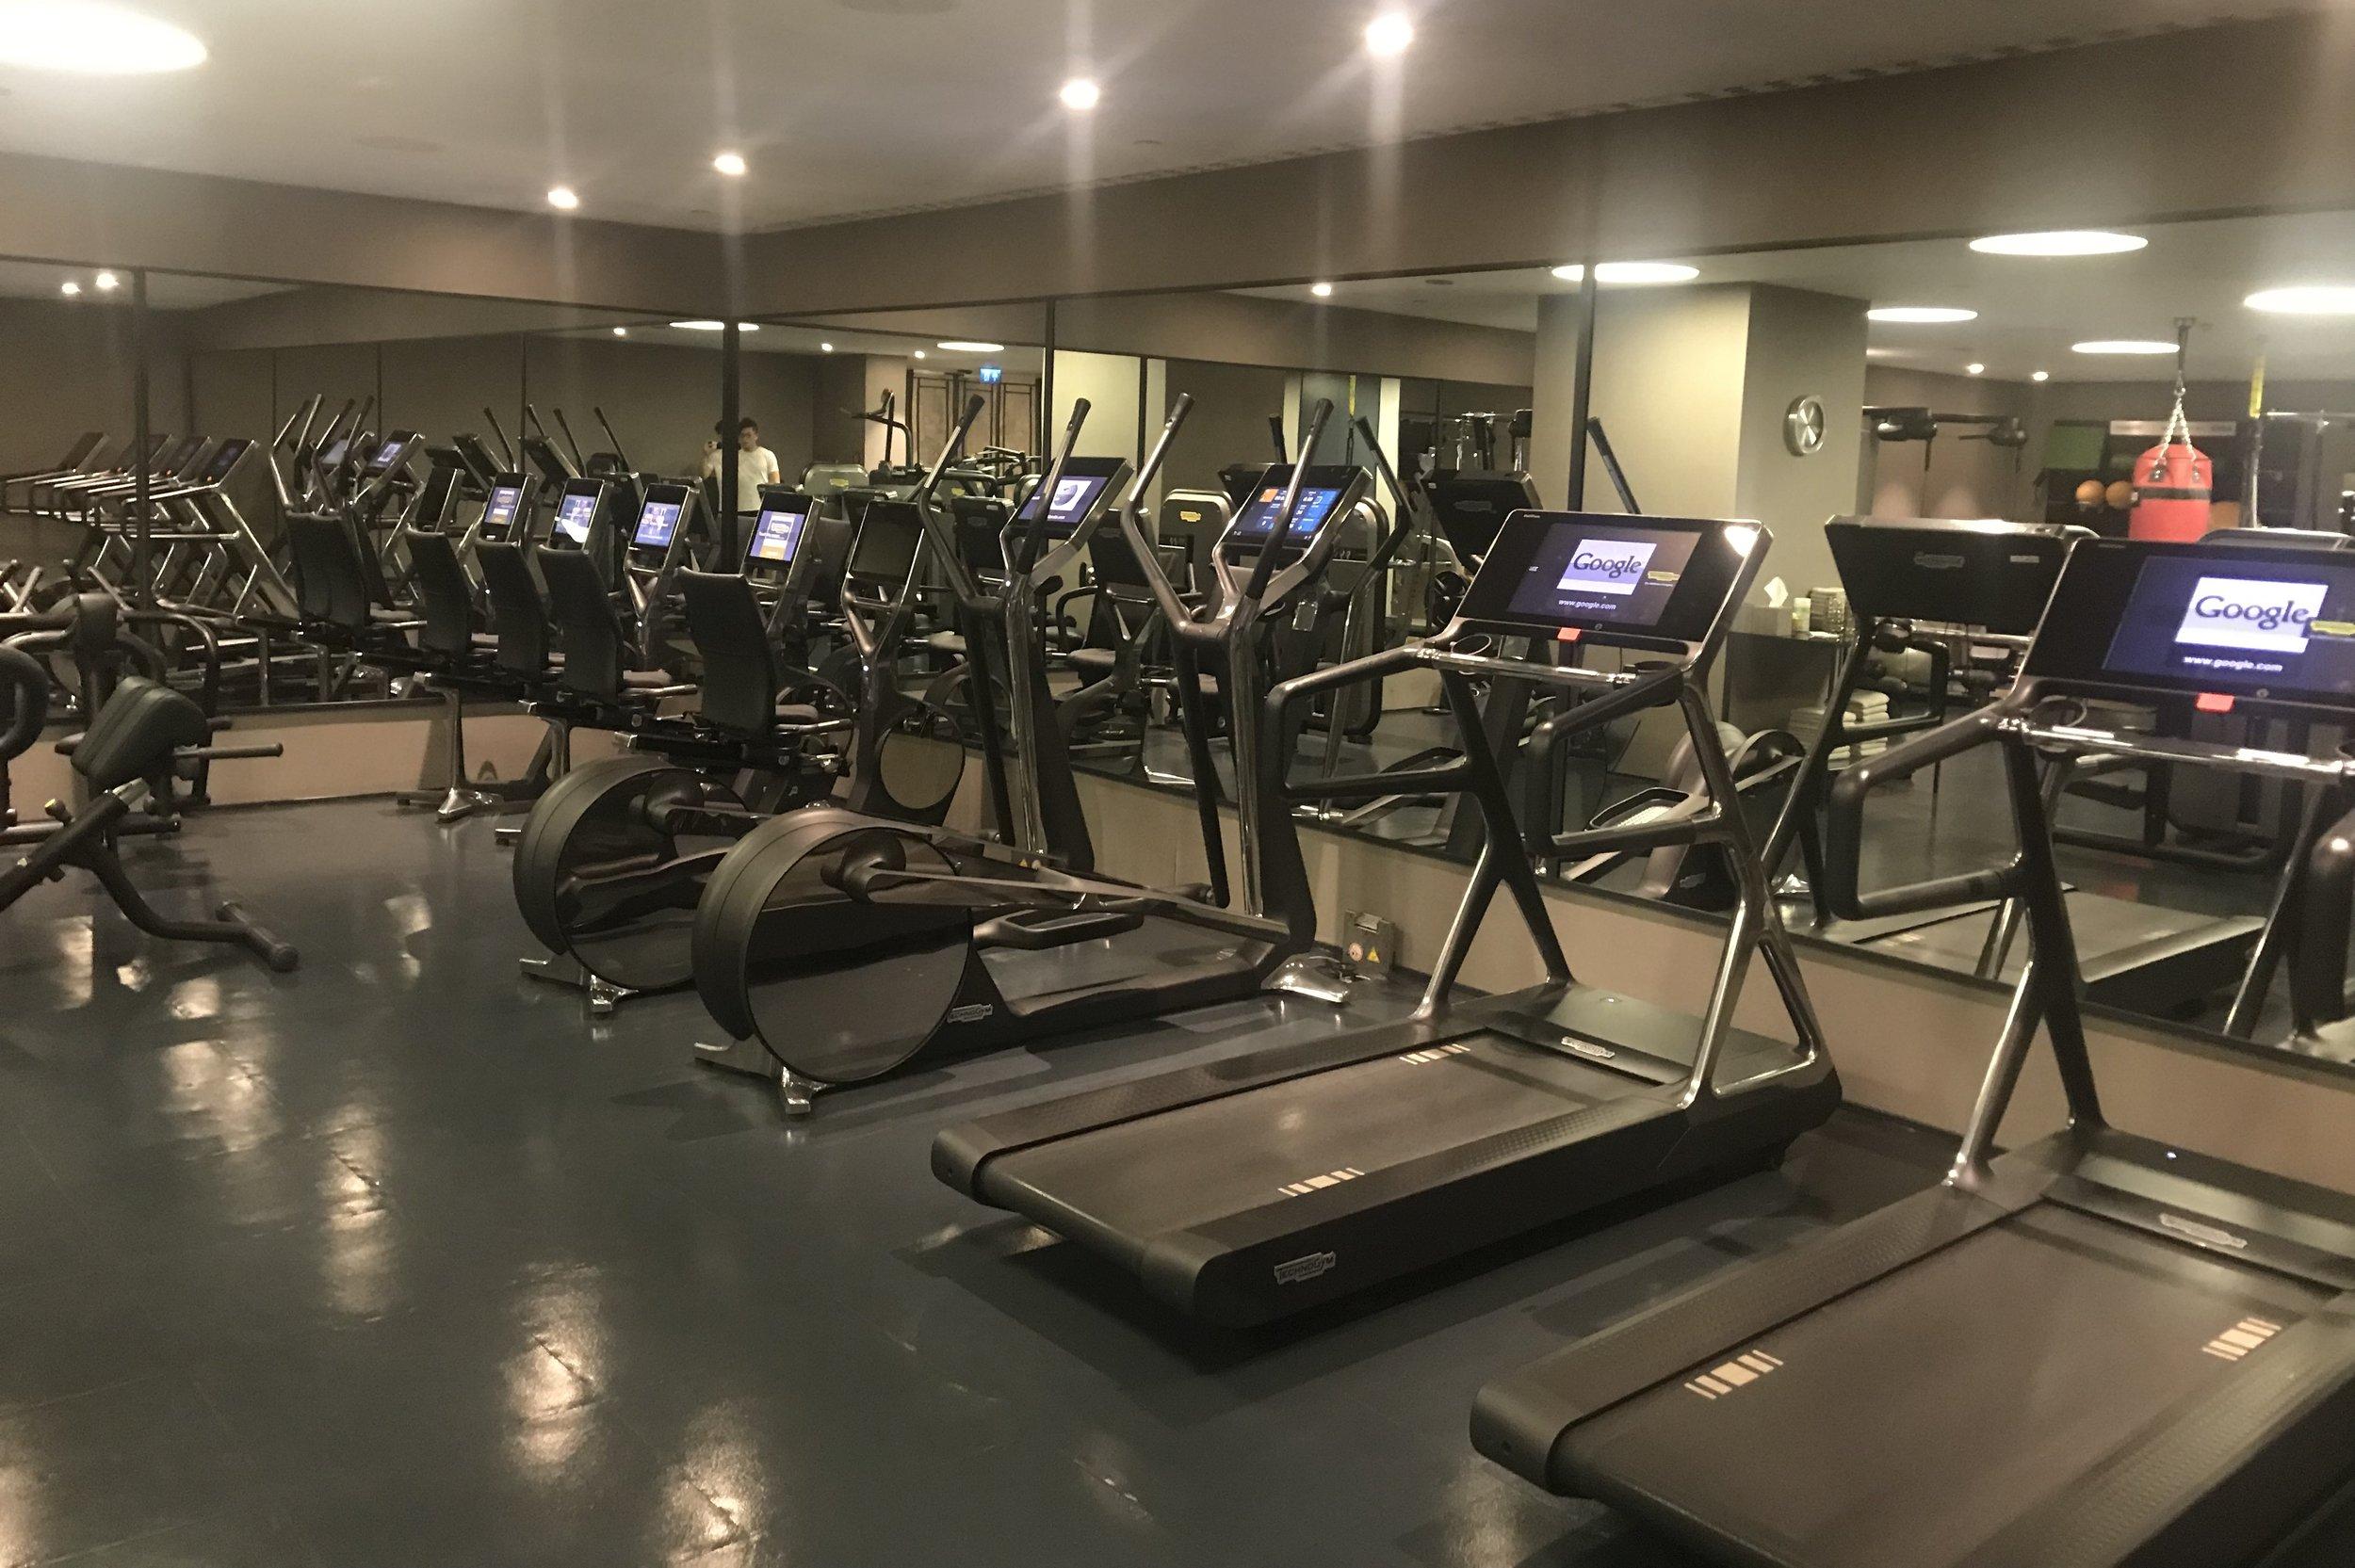 St. Regis Istanbul – Gym equipment